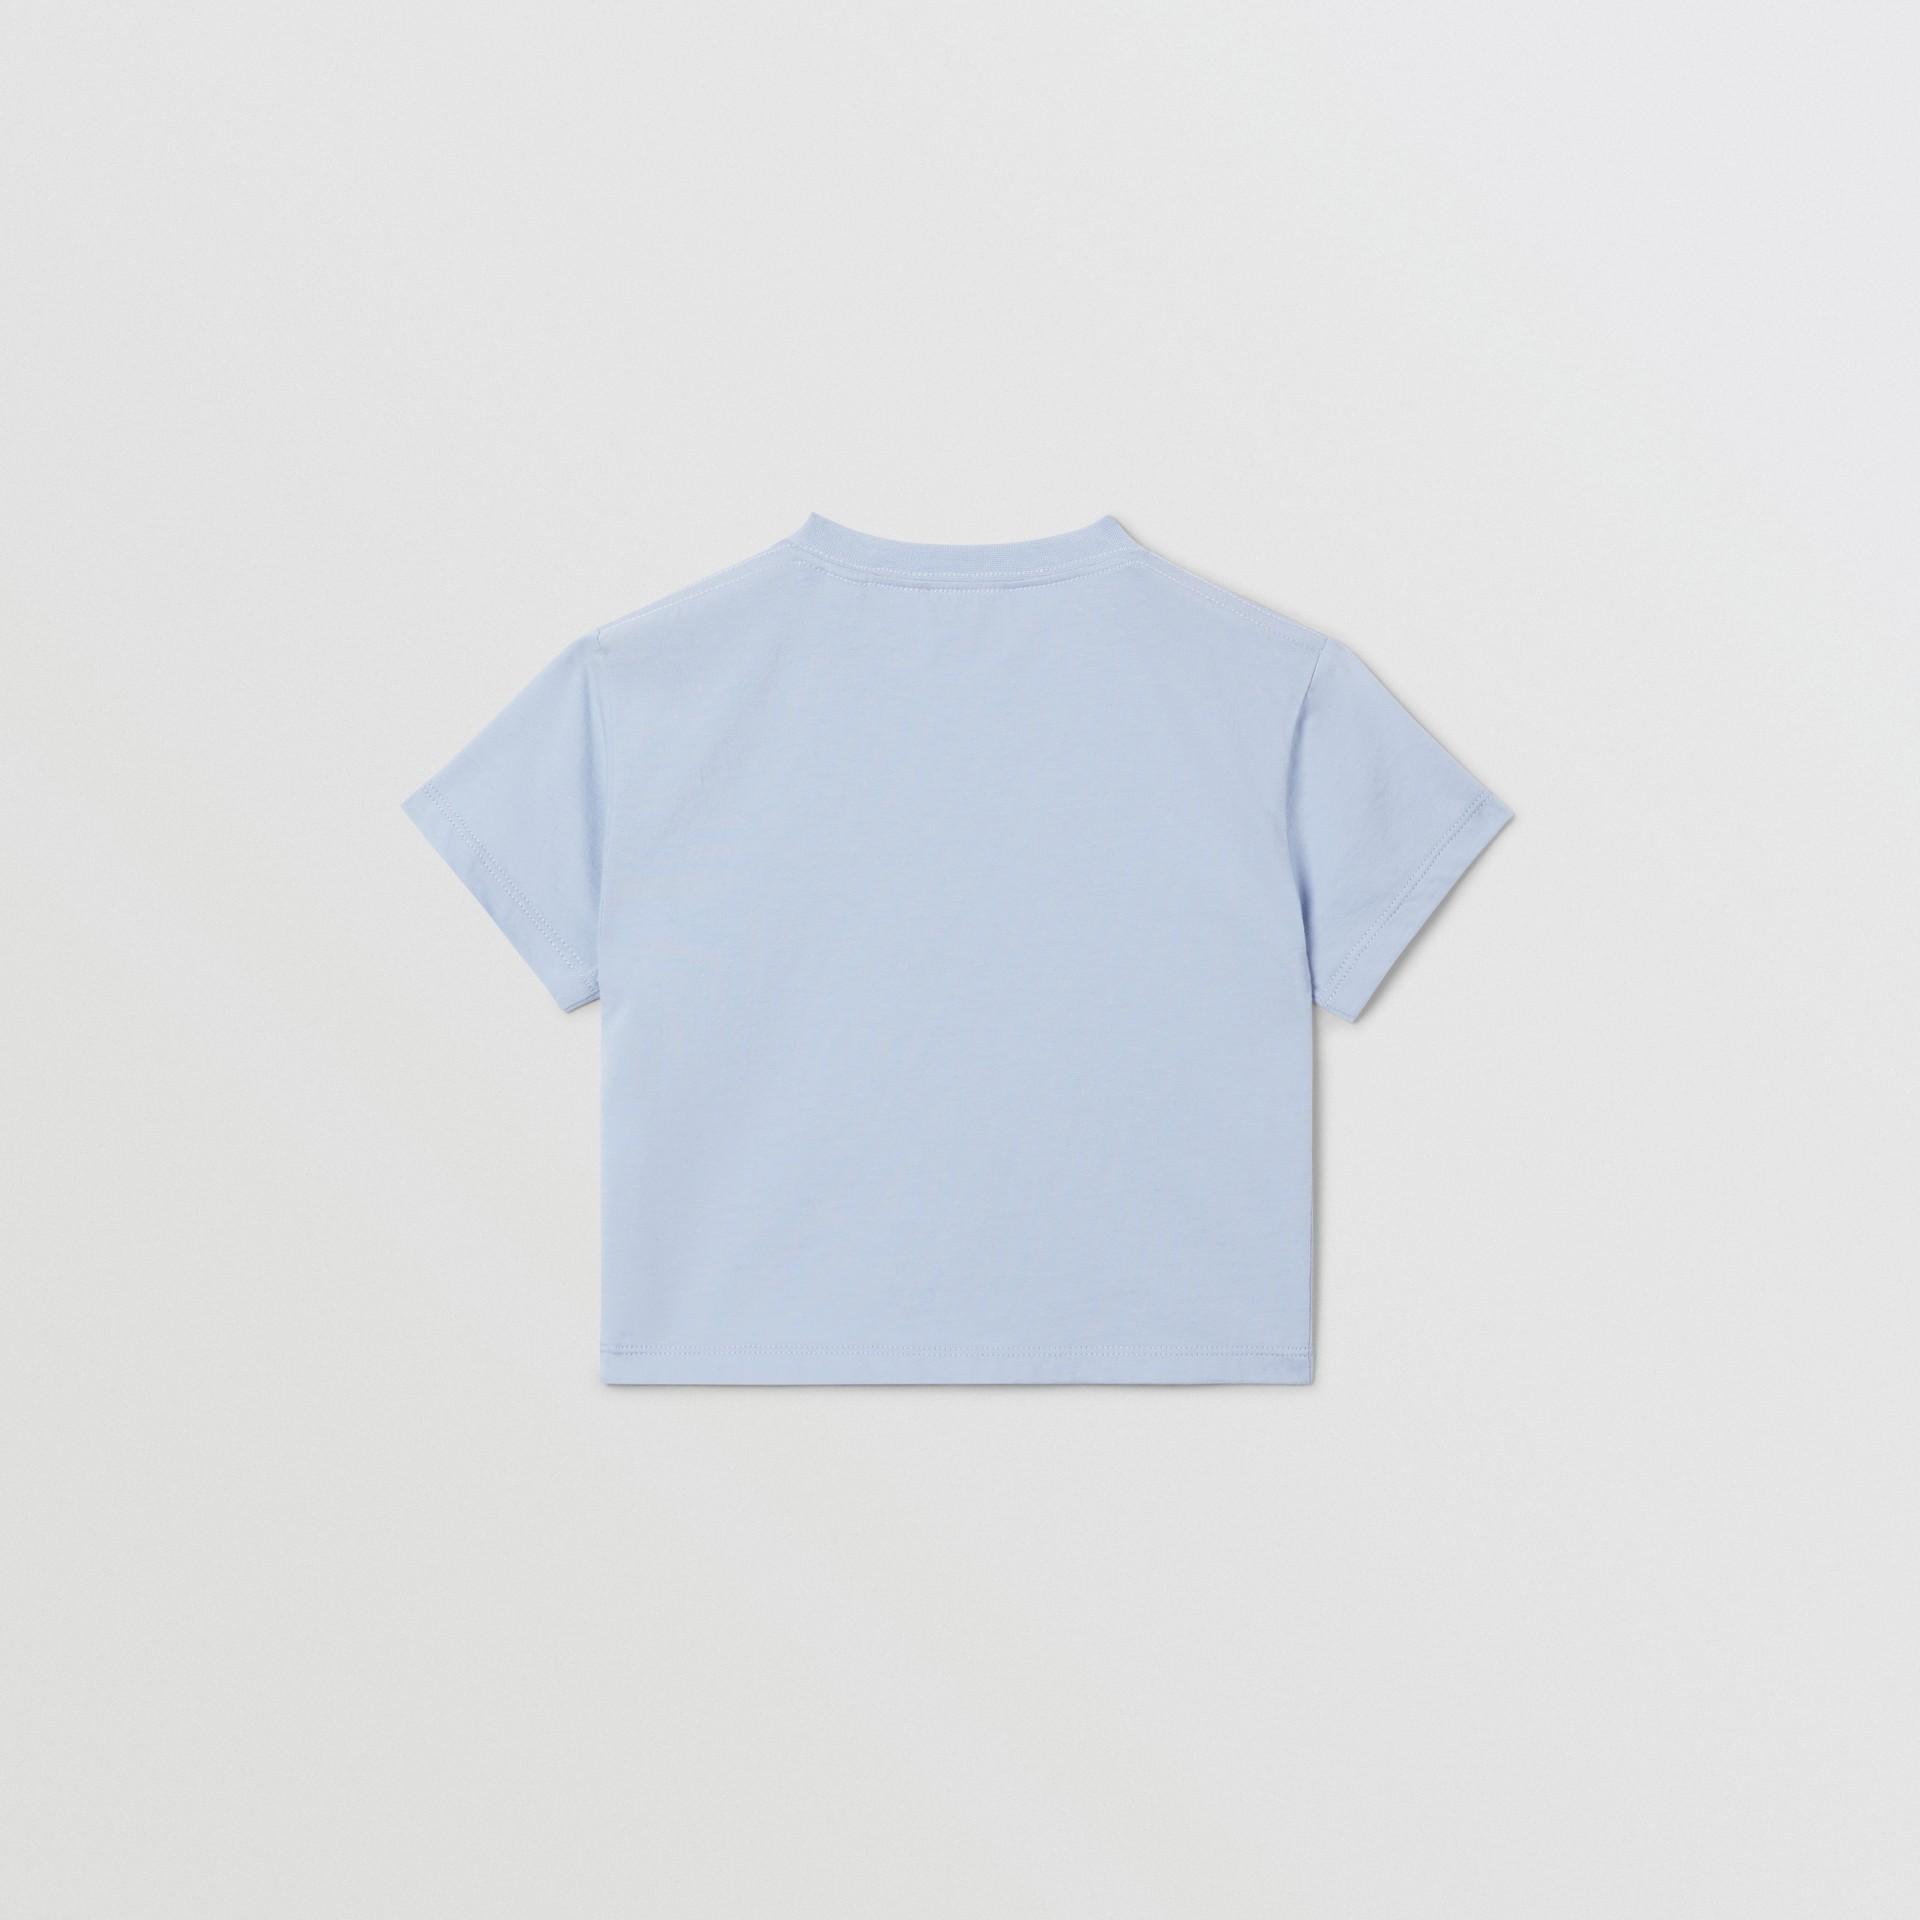 Logo Print Cotton T-shirt in Light Blue - Children | Burberry Canada - gallery image 4